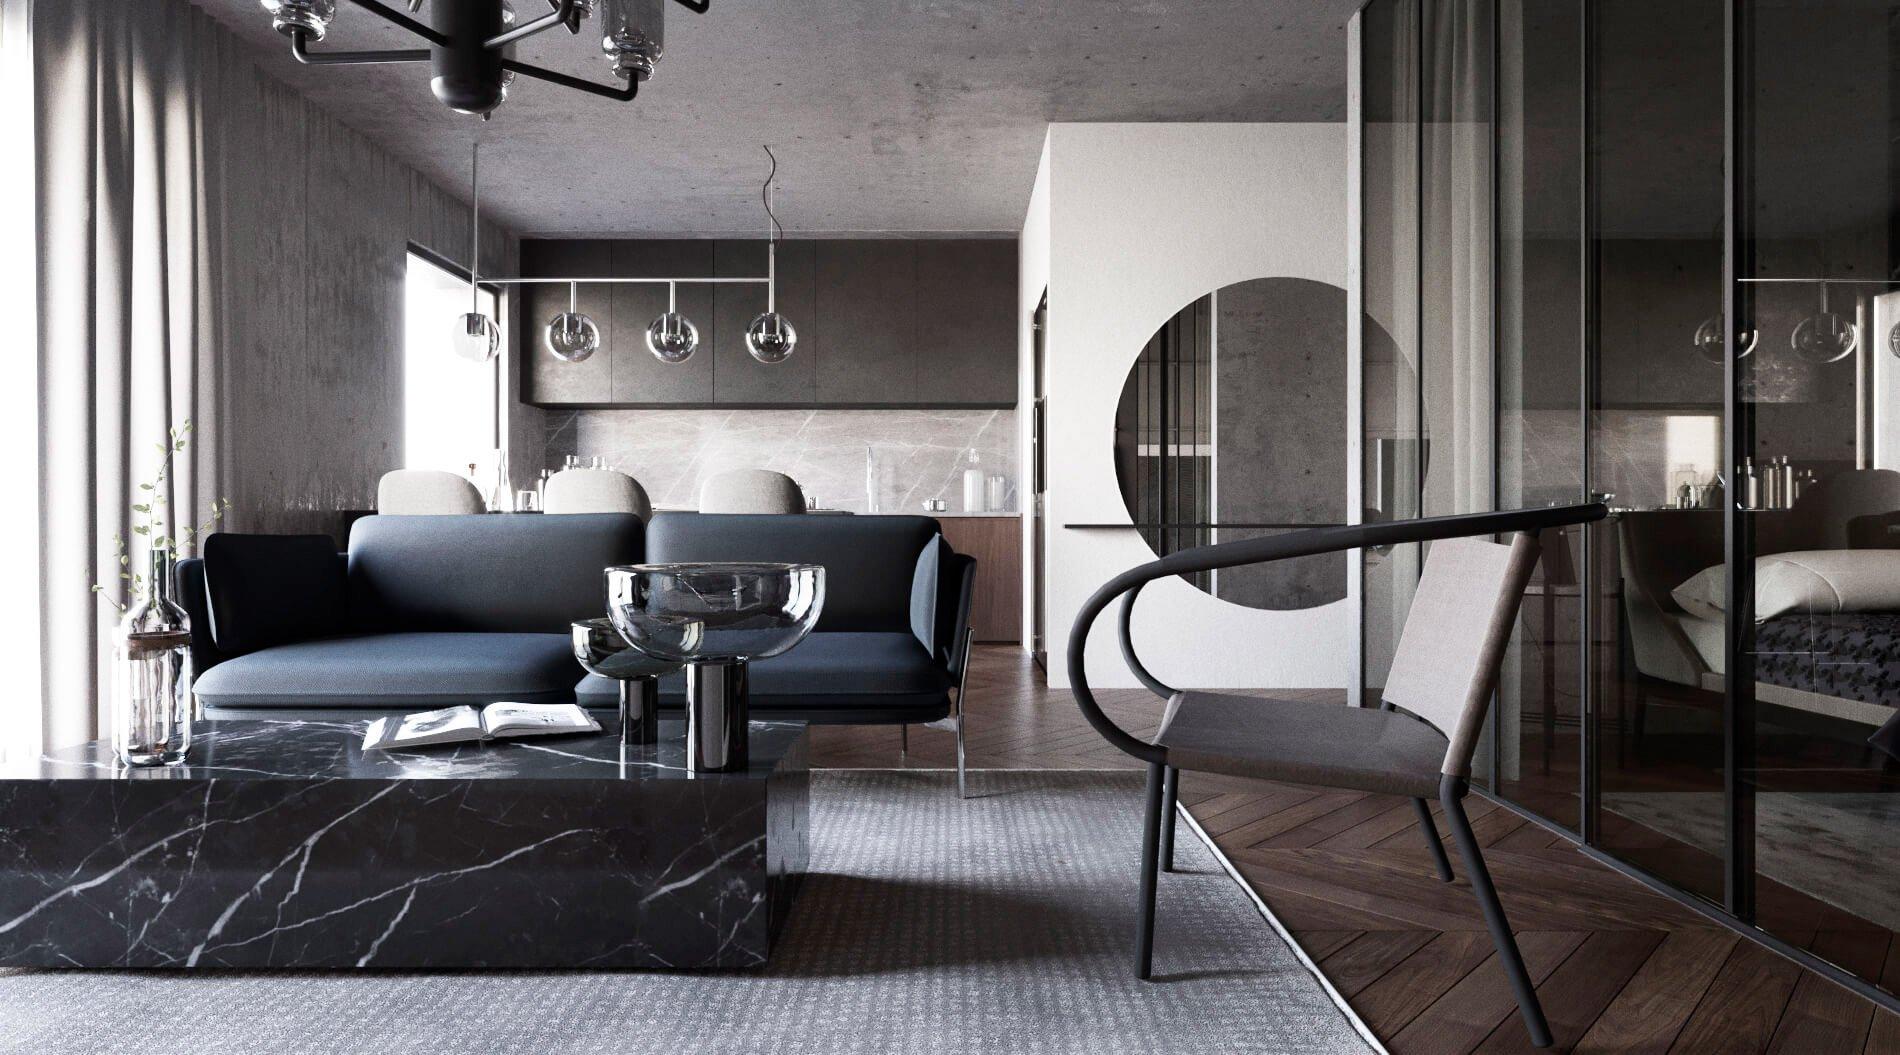 Turn key apartments - Interior design